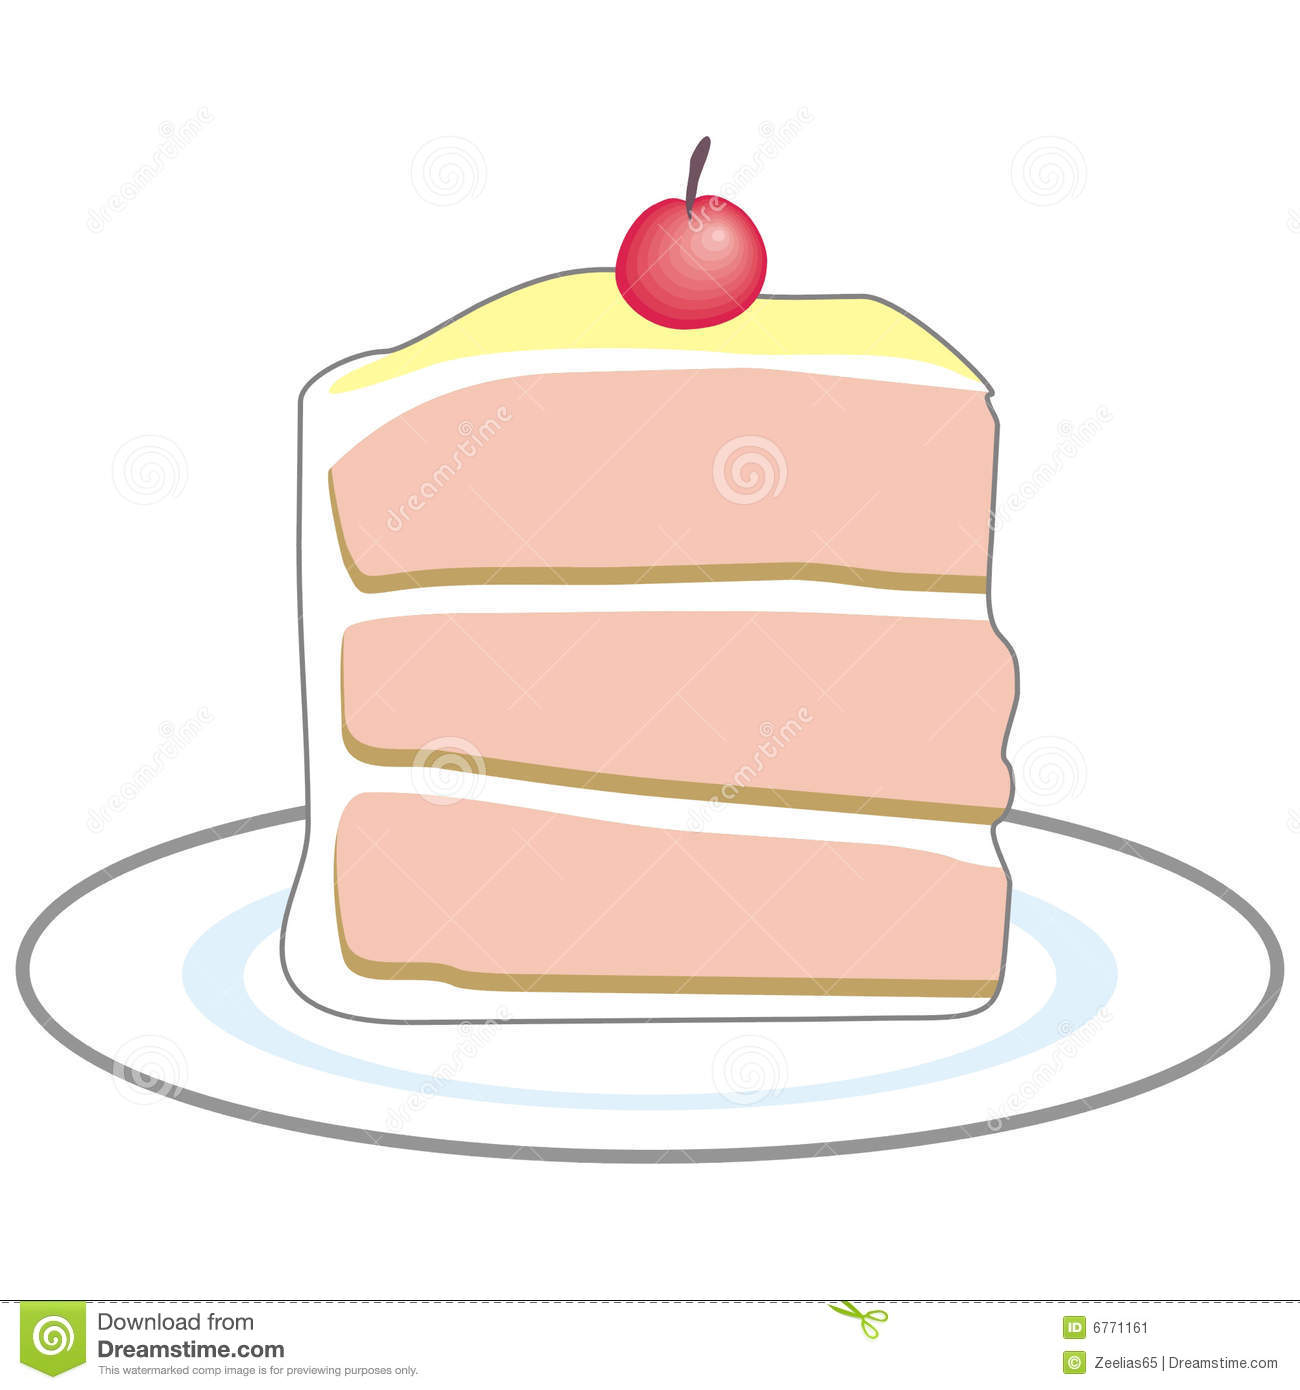 Slice cake art clipart clip art black and white Piece Of Cake Clipart & Piece Of Cake Clip Art Images - ClipartALL.com clip art black and white